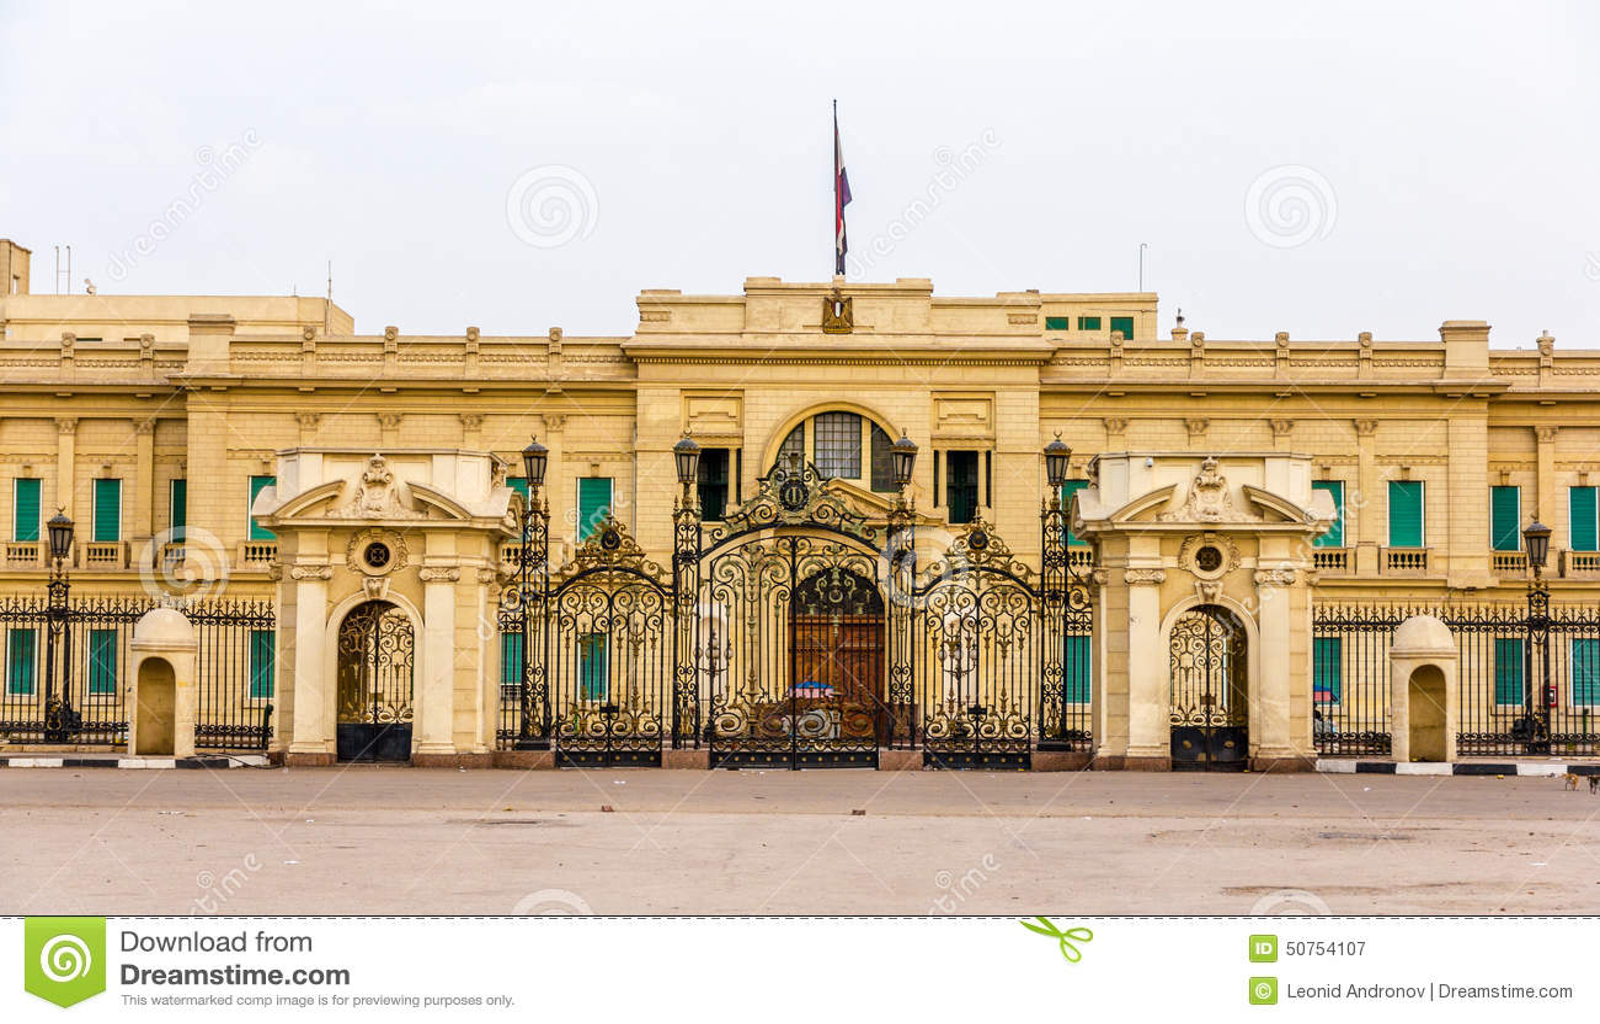 Abdeen Palace A Residence Of The President Egypt